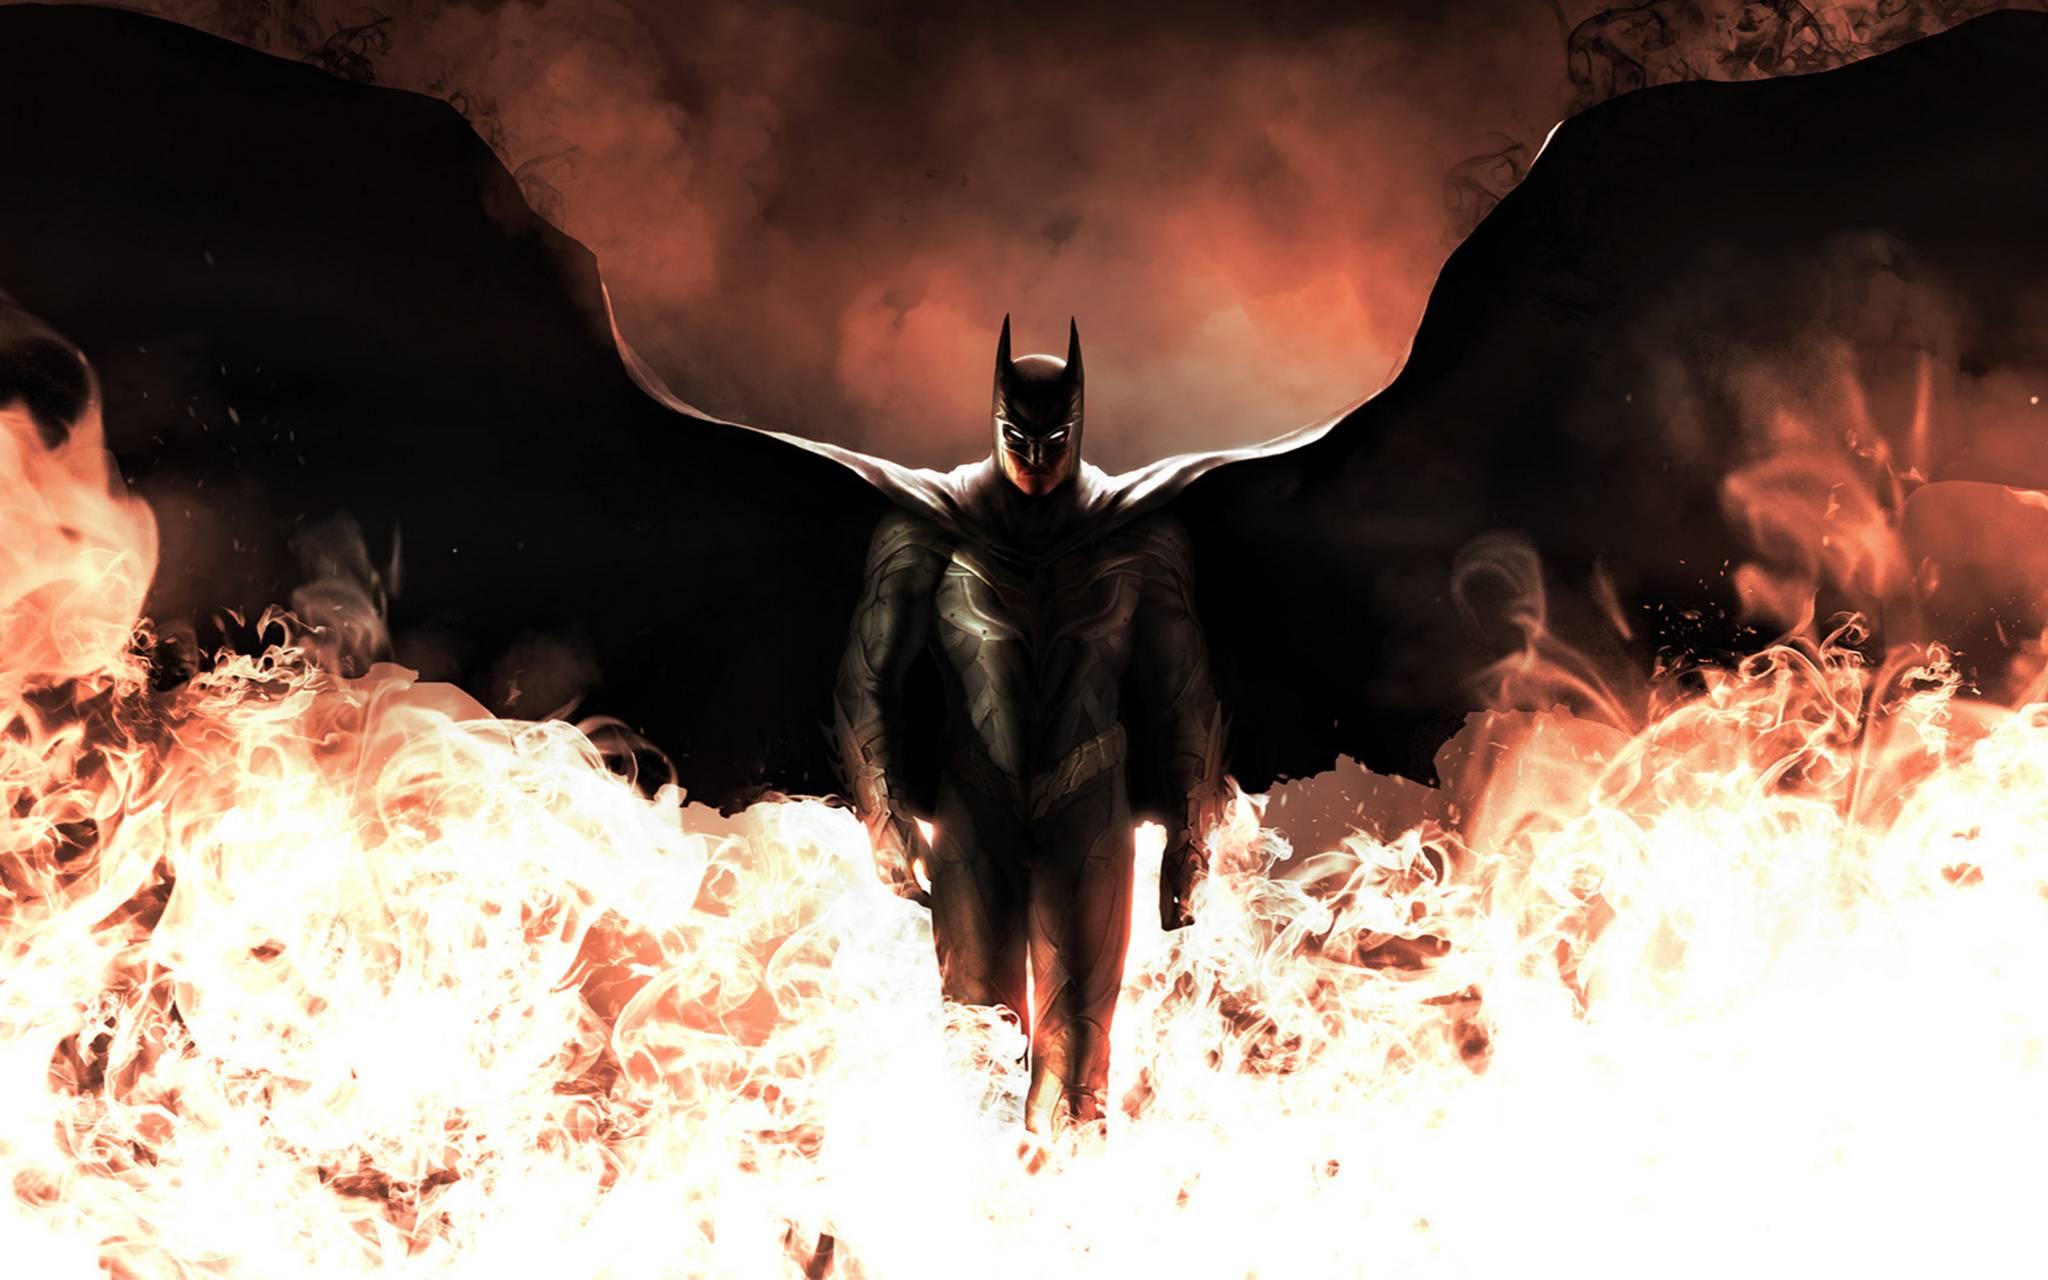 Batman through Fire